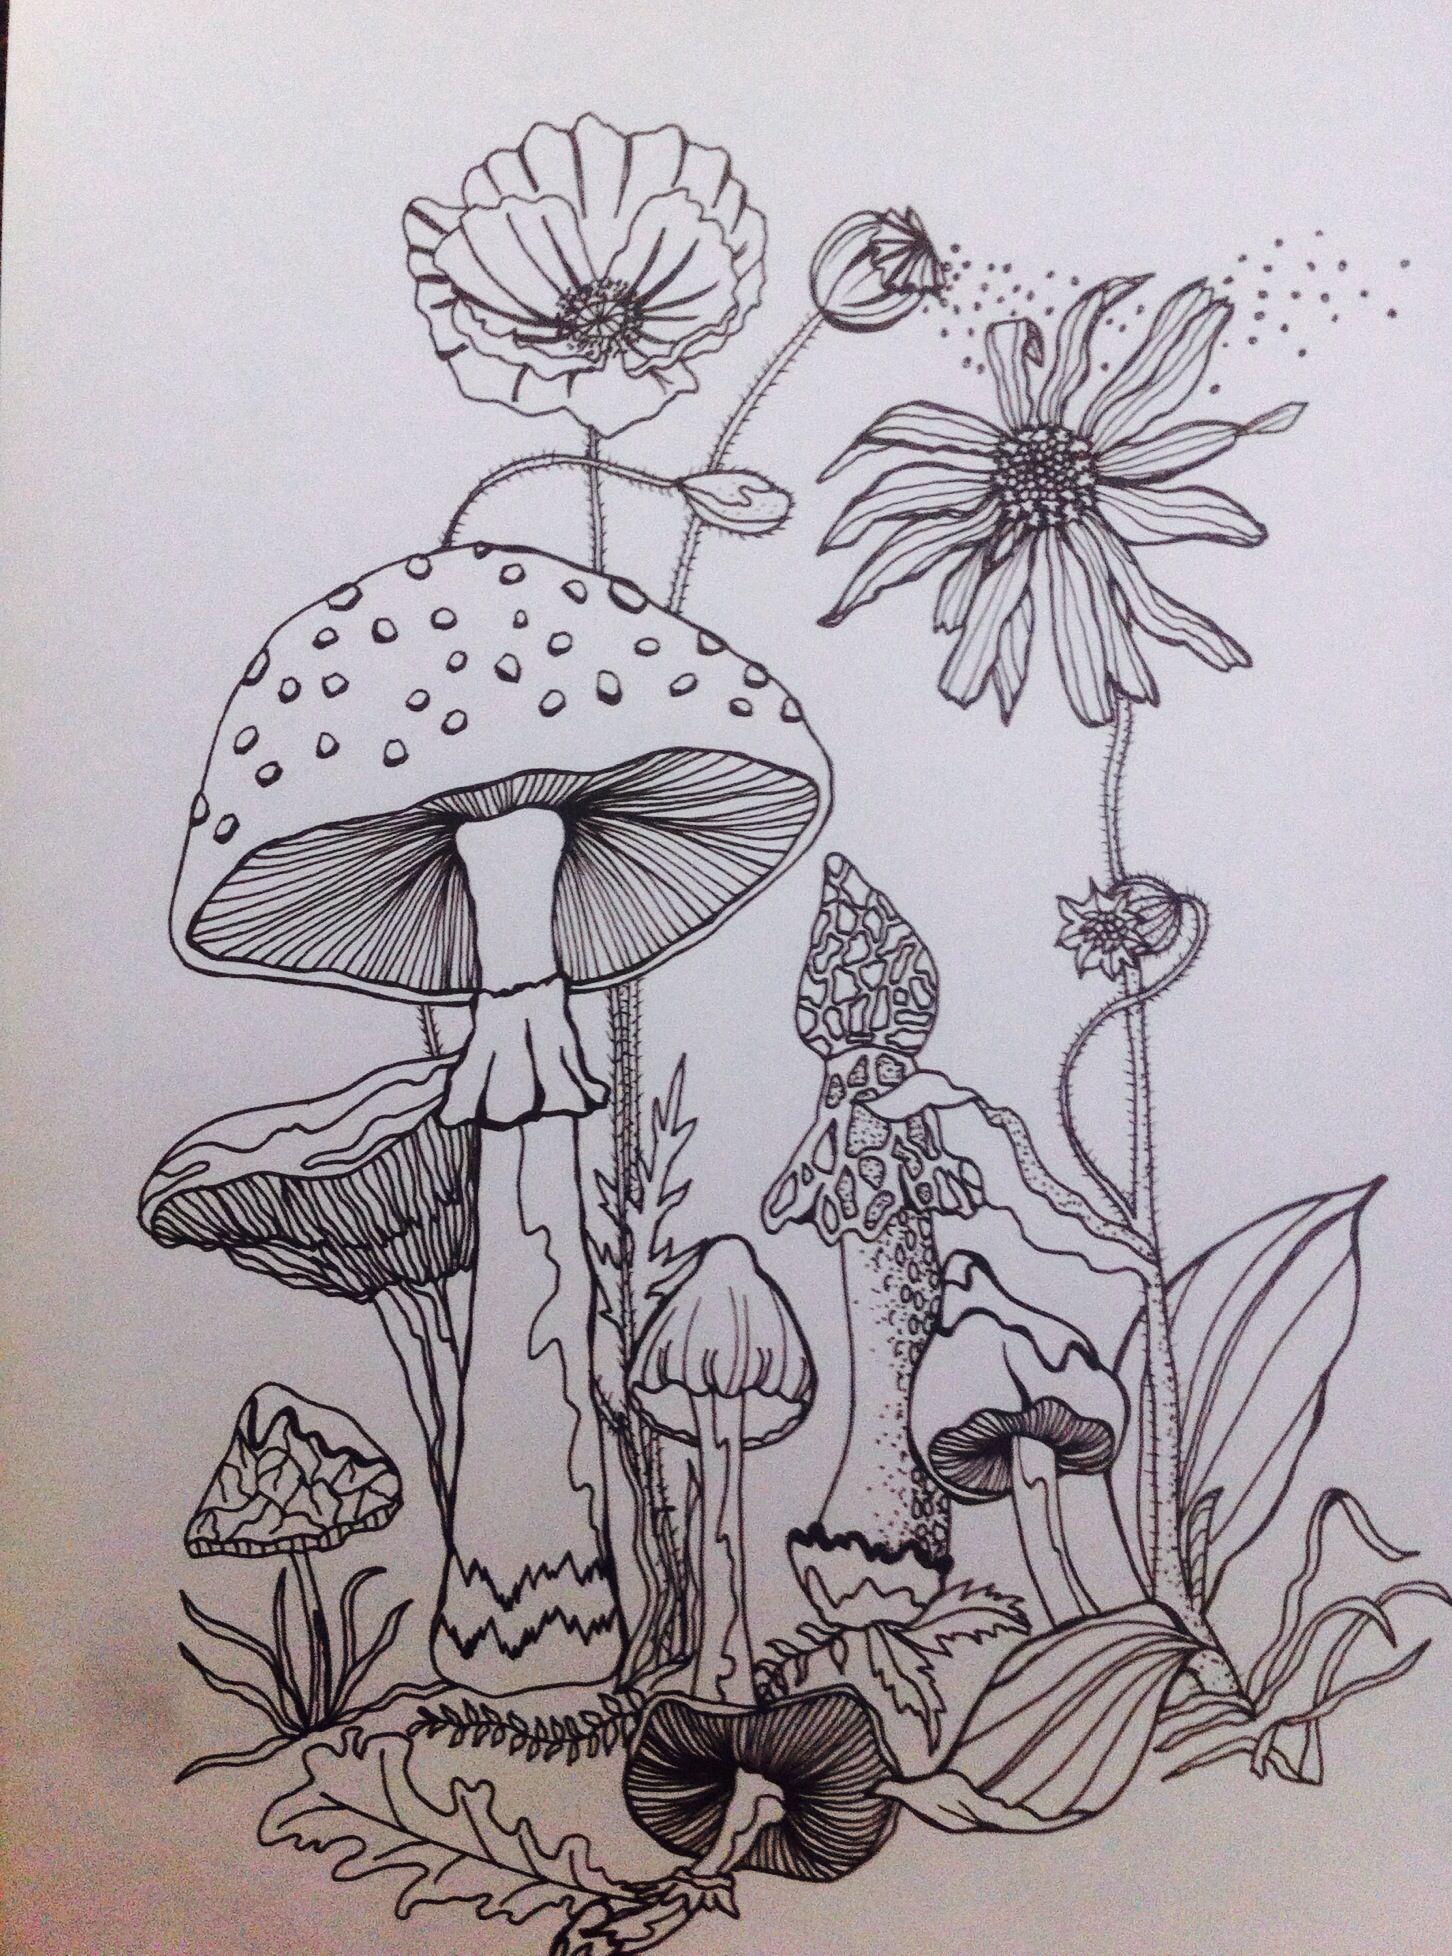 Uncategorized Mushroom Drawing mushrooms limited edition giclee print forrest drawing www jessicalindblombrice com httpfelt co